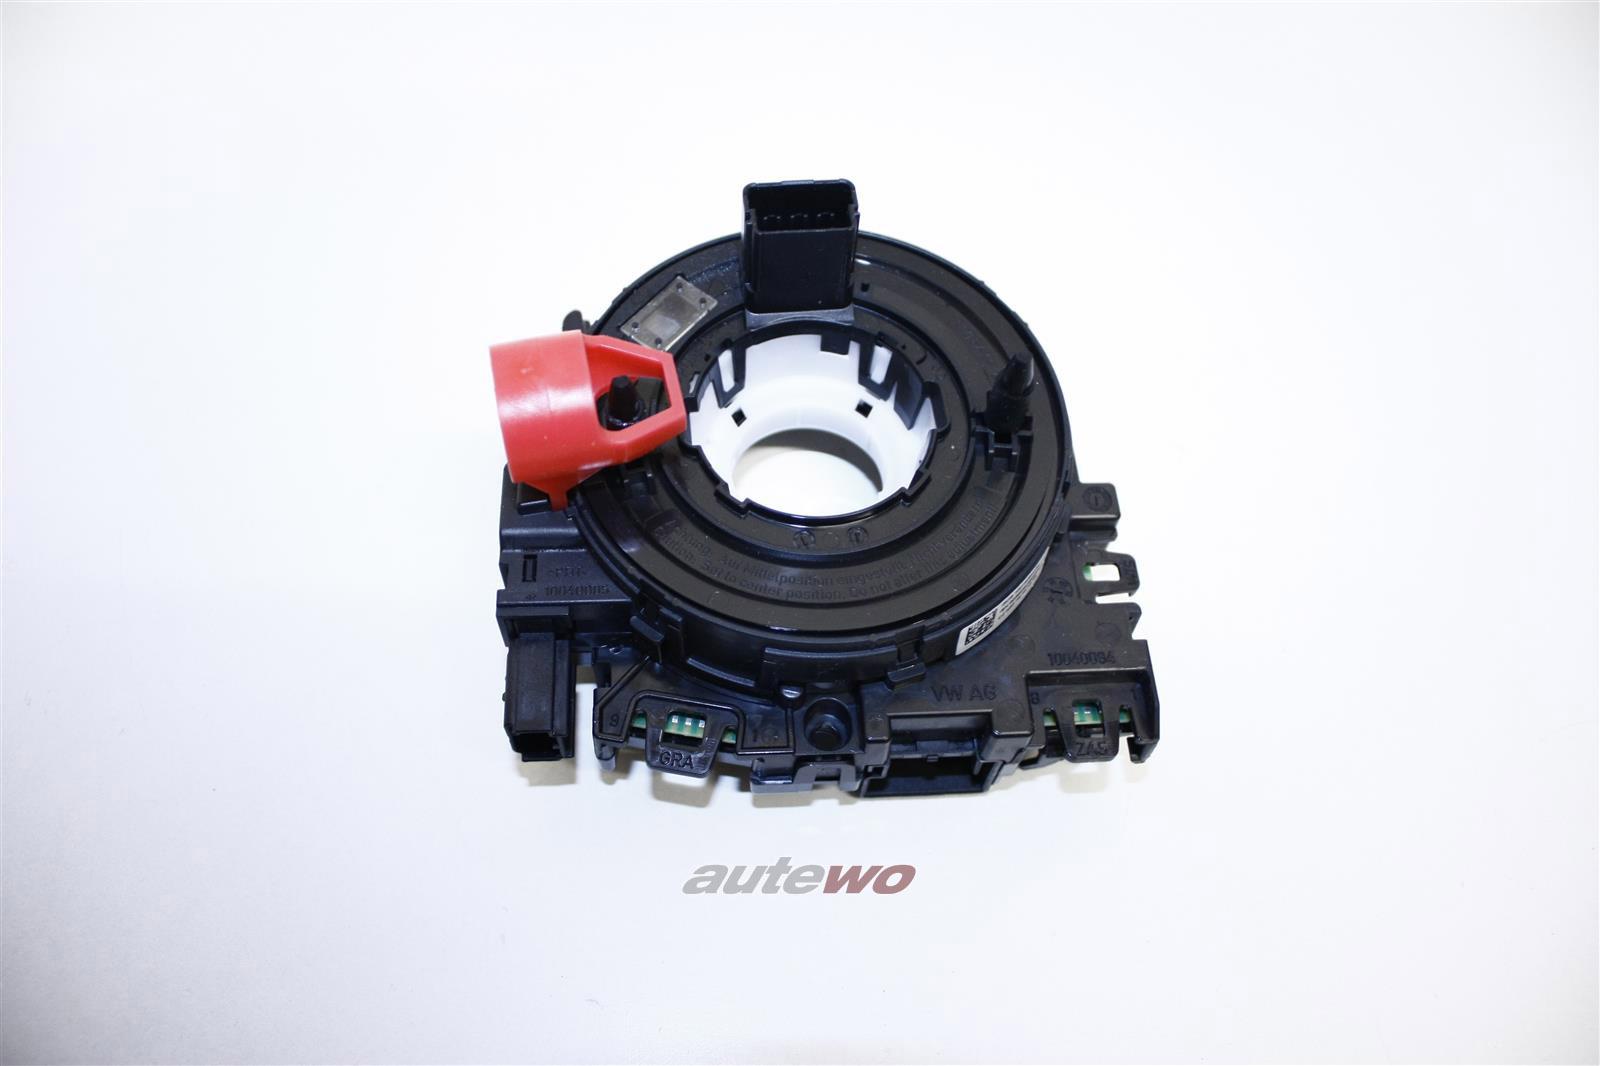 NEU&ORIGINAL Audi/VW/SEAT/Skoda A3 8V Elektronikmodul Lenkstockschalter Schleifring 5Q0953549A 5Q0953549